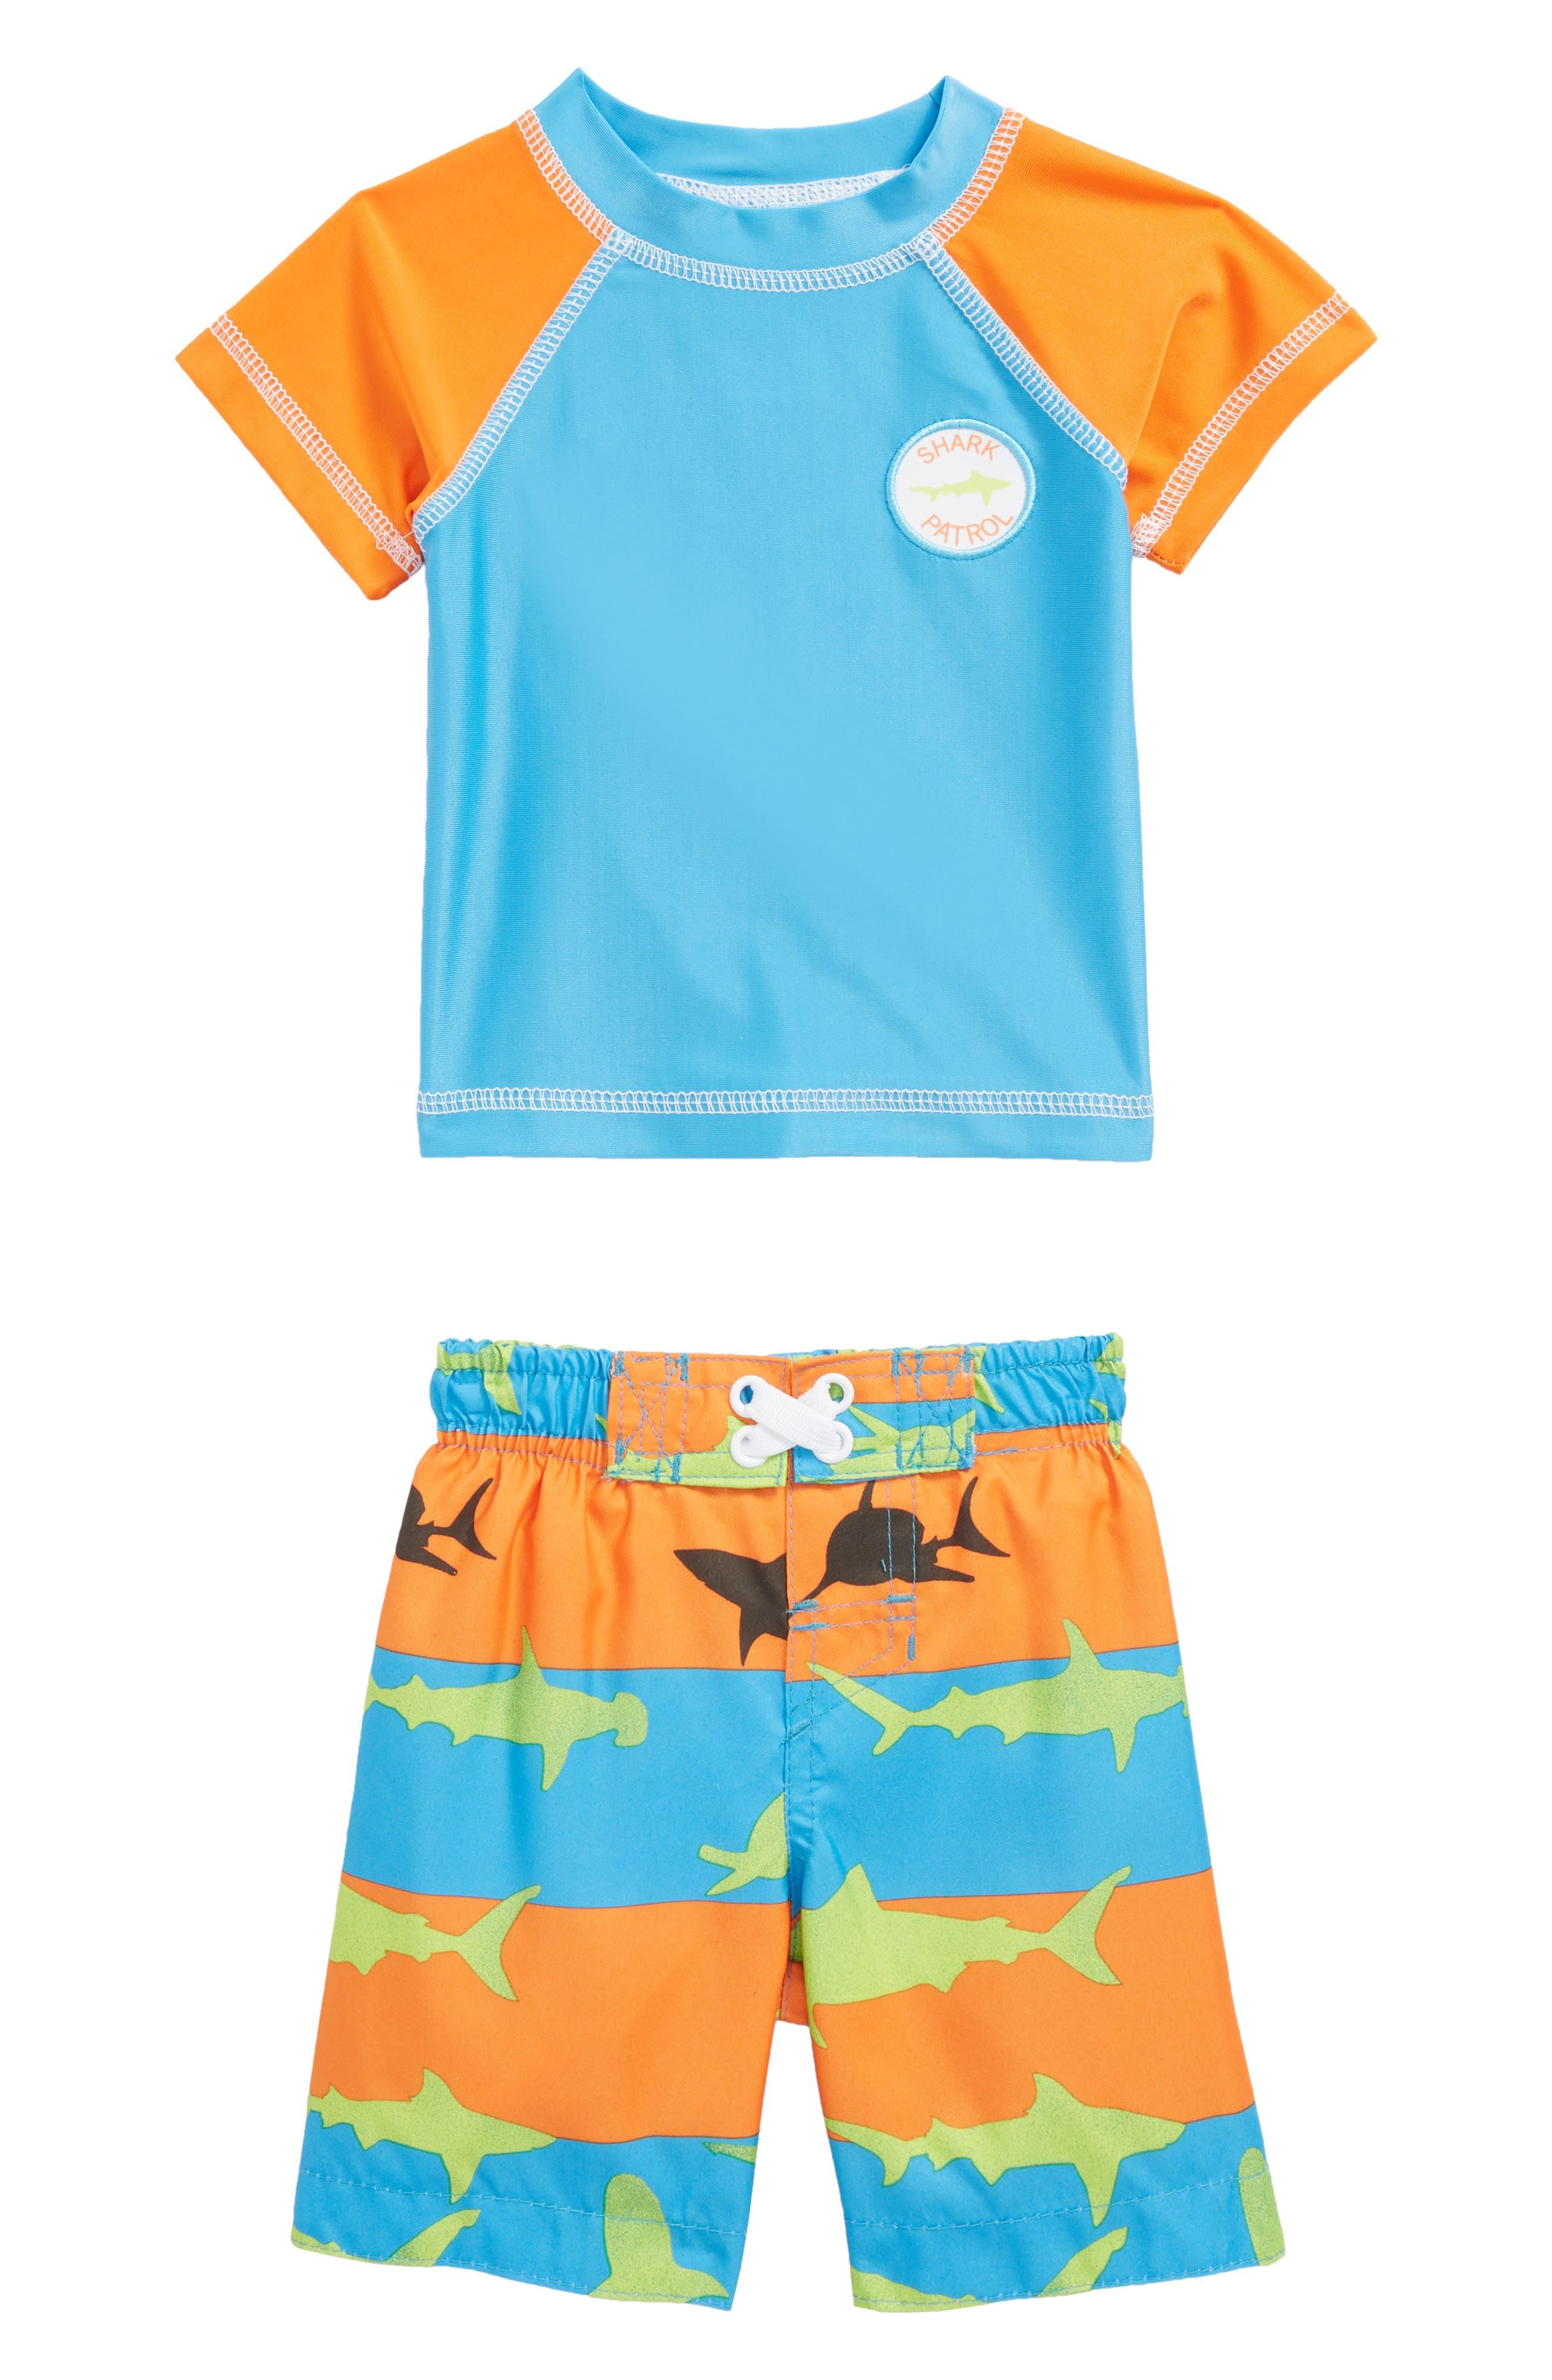 Shark Illusion Two-Piece Rashguard Swimsuit,                         Main,                         color, Blue Multi